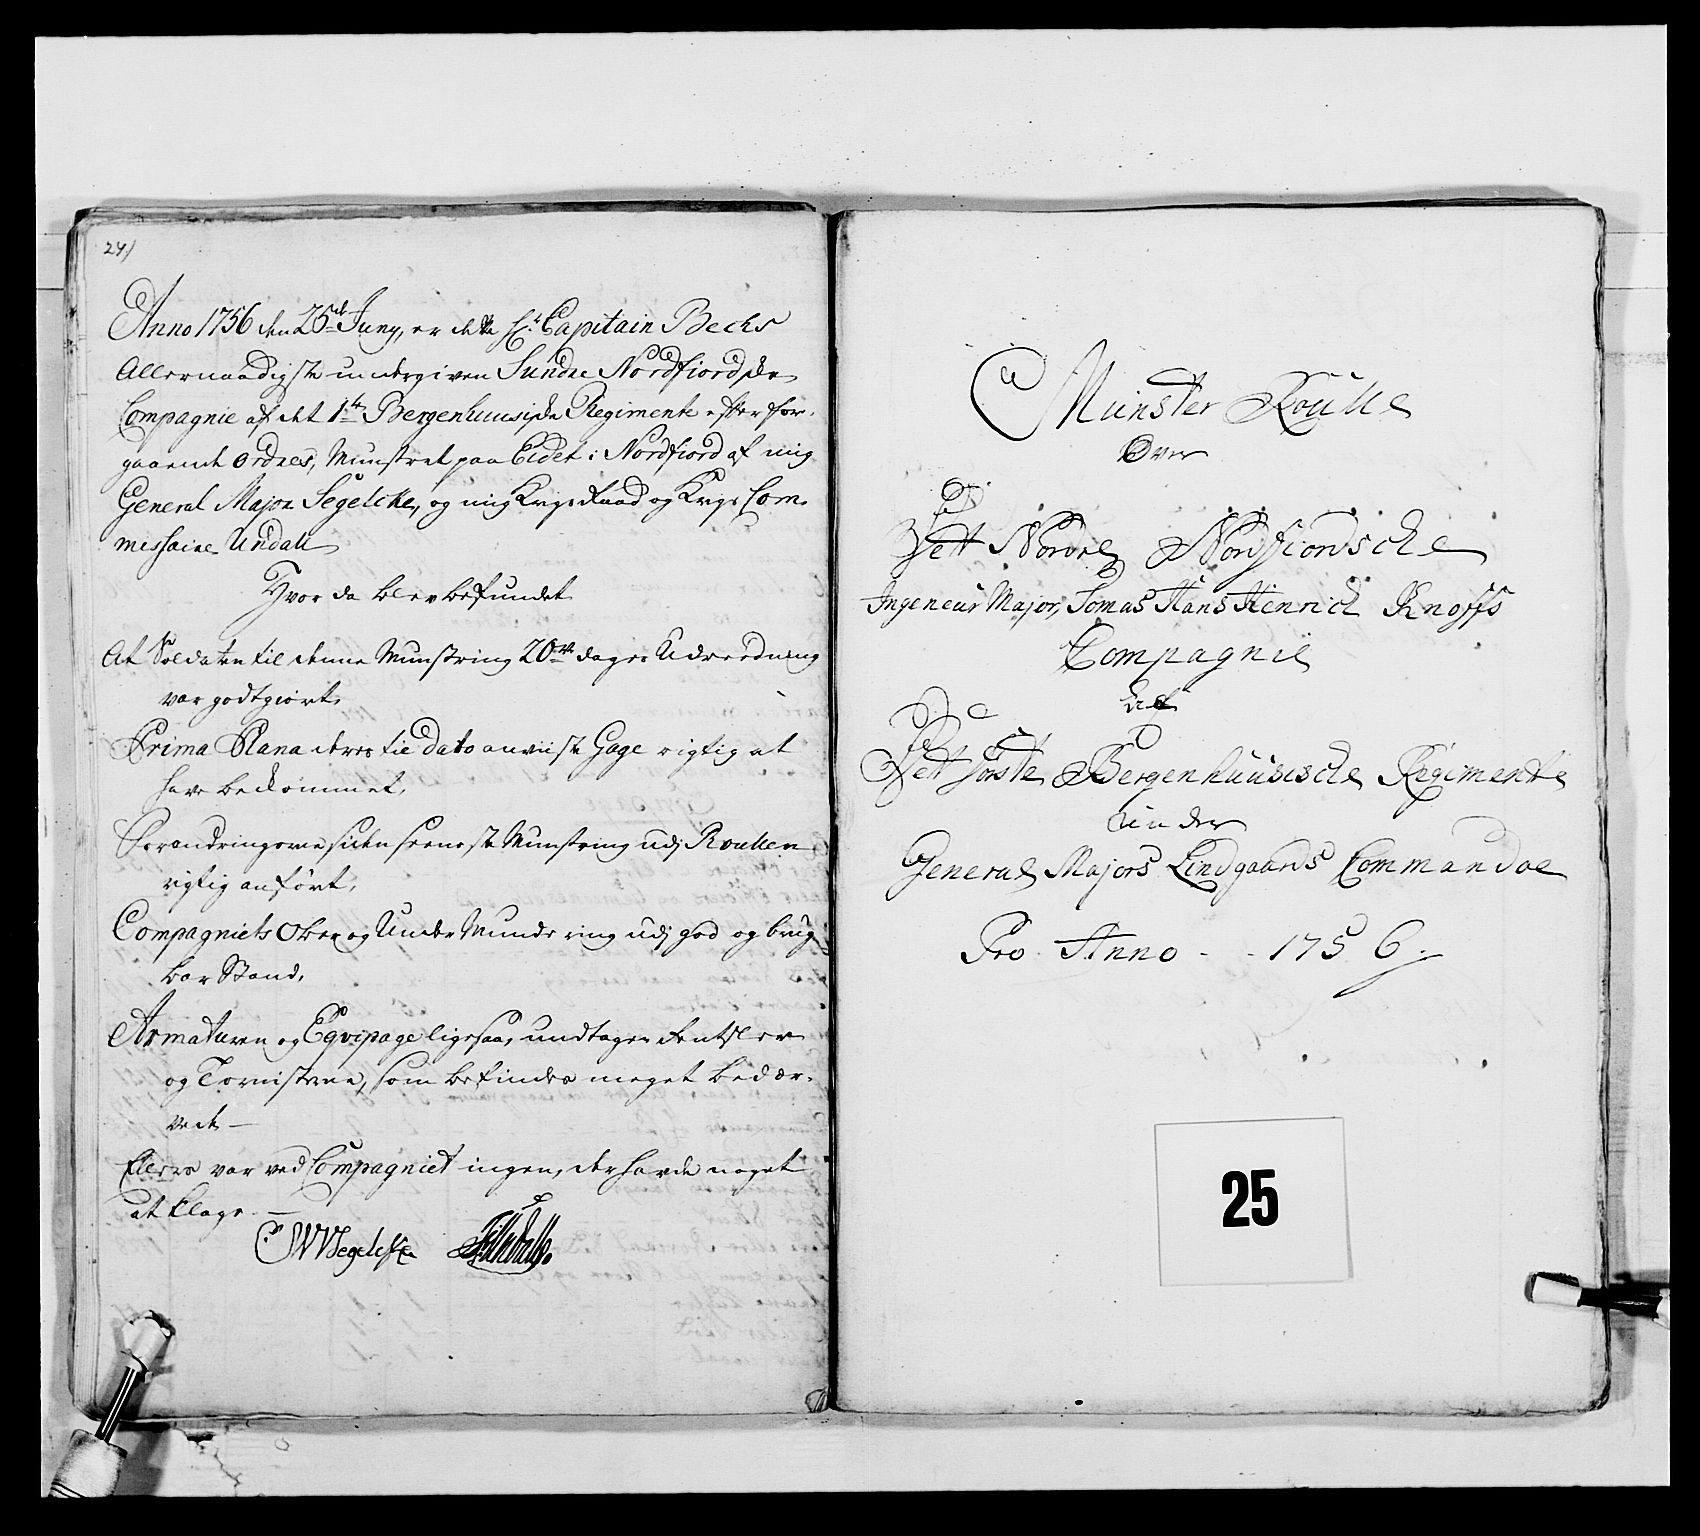 RA, Kommanderende general (KG I) med Det norske krigsdirektorium, E/Ea/L0517: 1. Bergenhusiske regiment, 1742-1756, s. 354